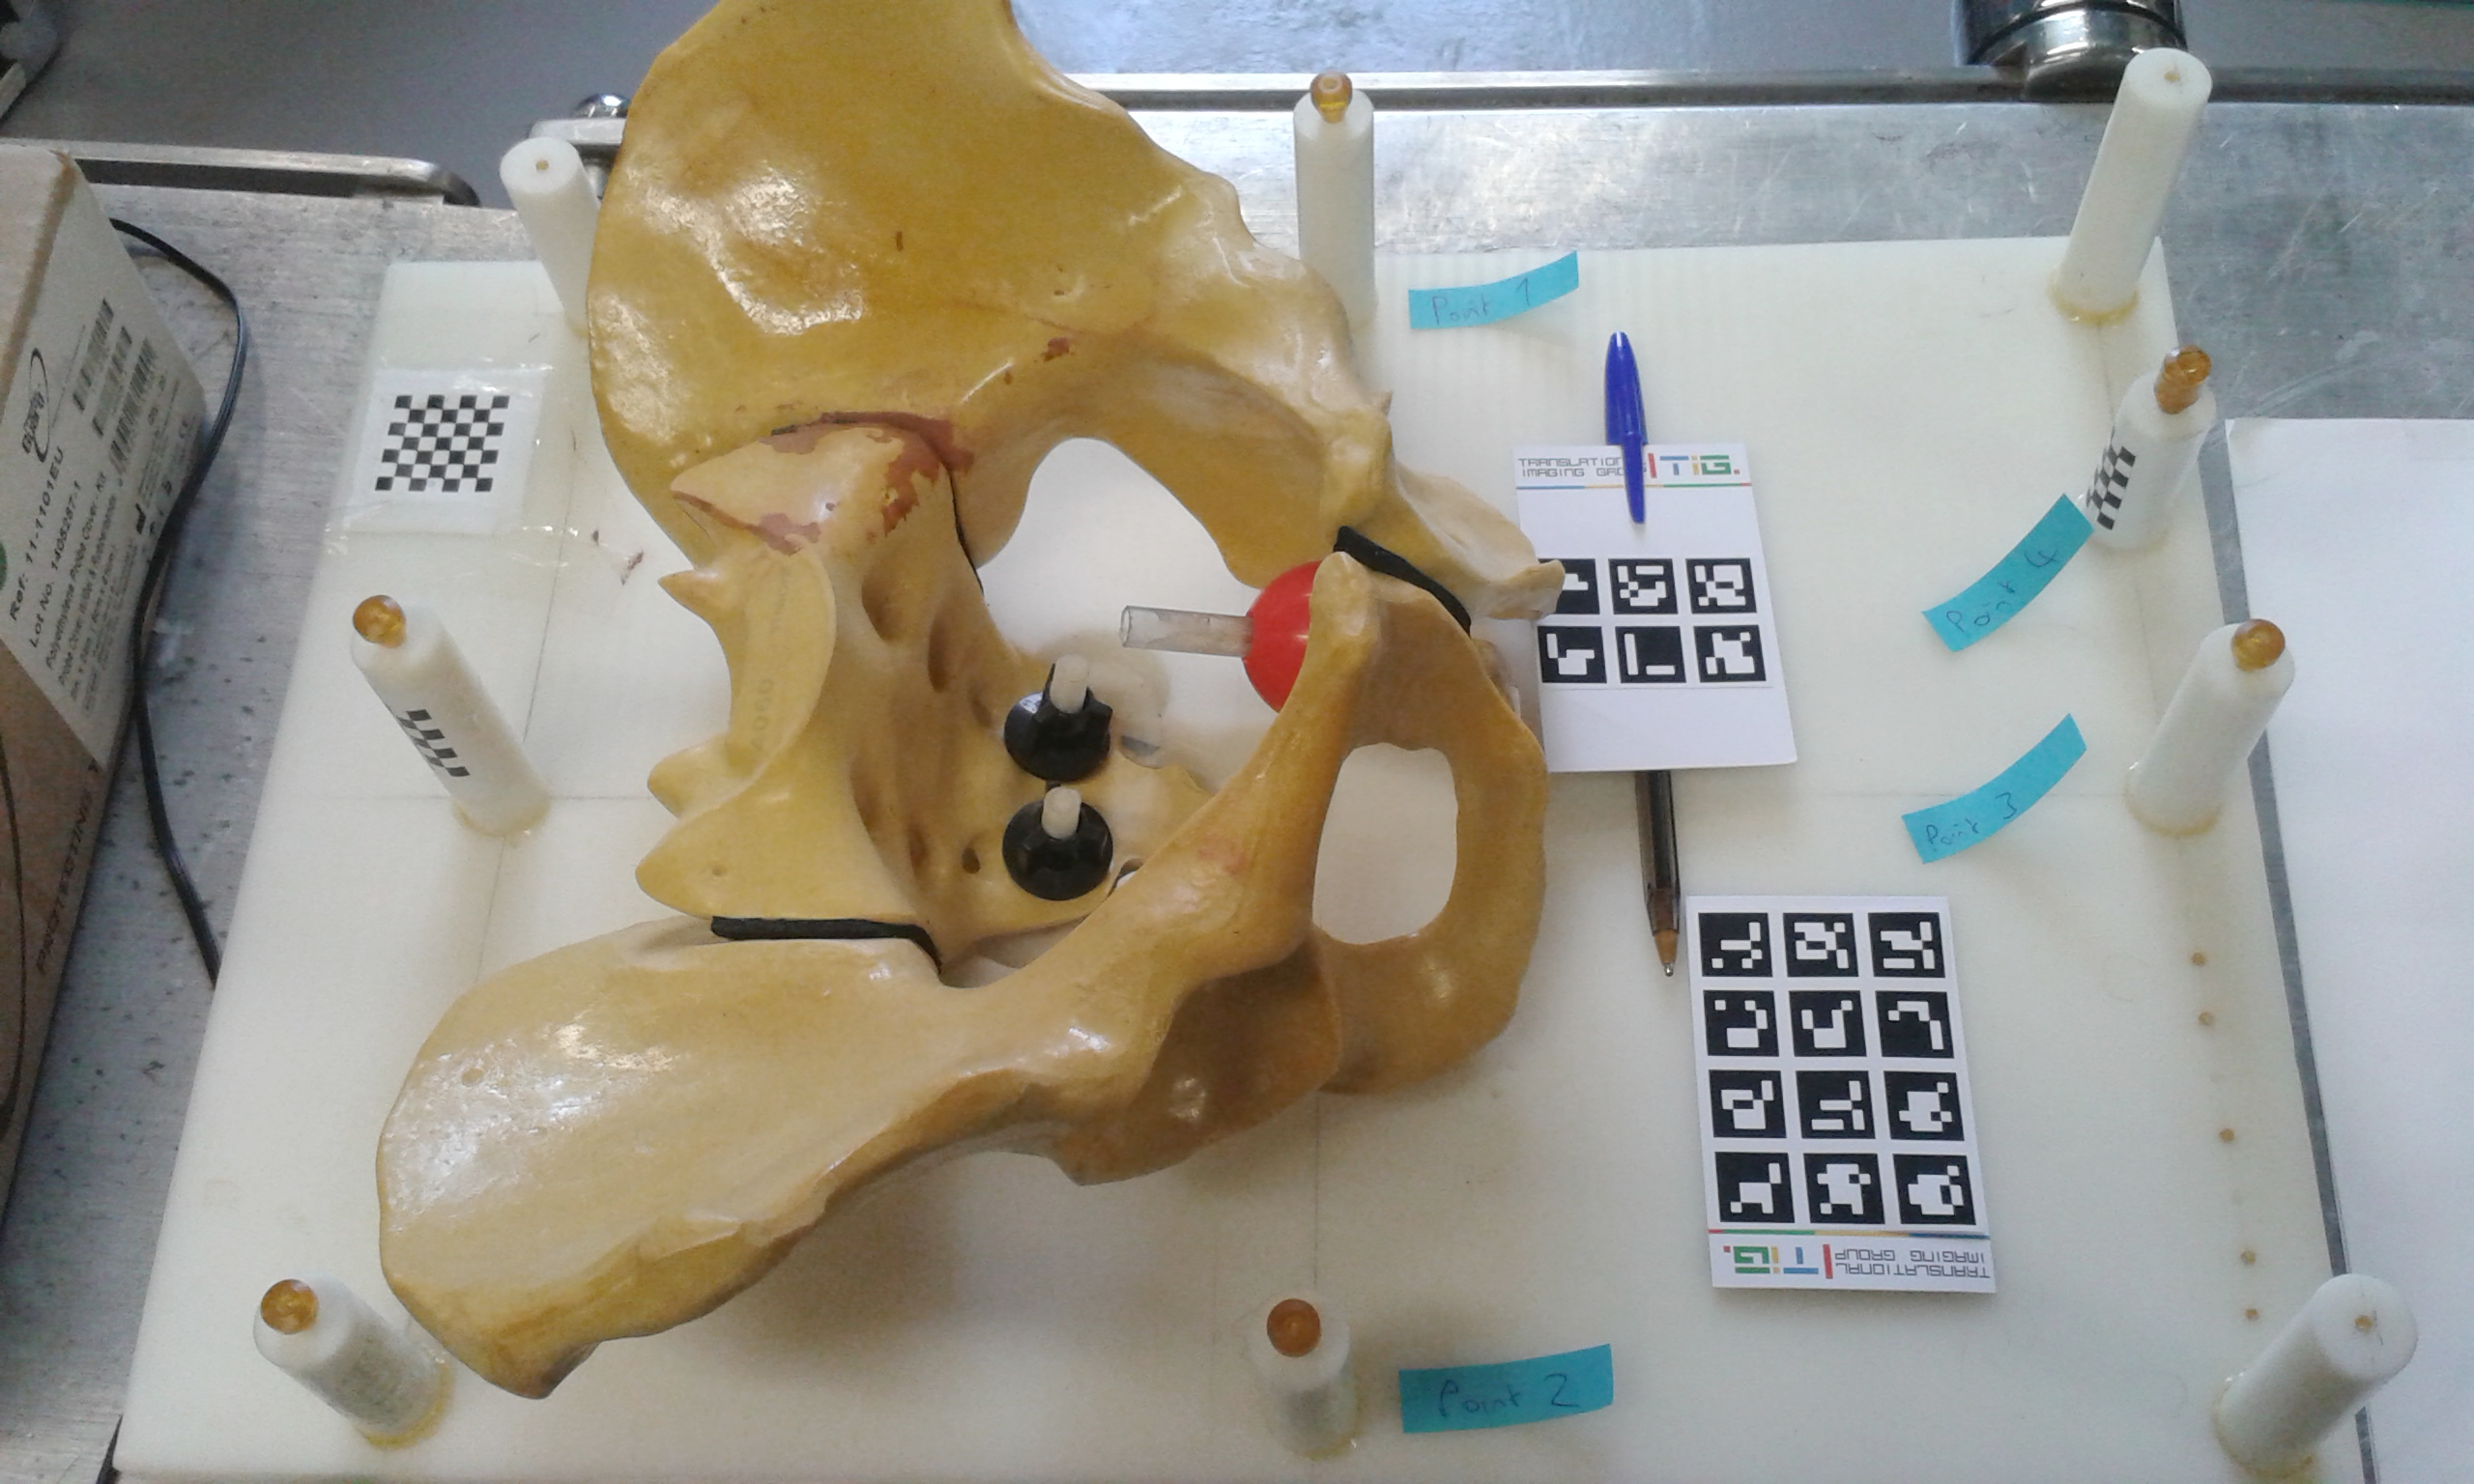 The pelvis phantom at UCL.